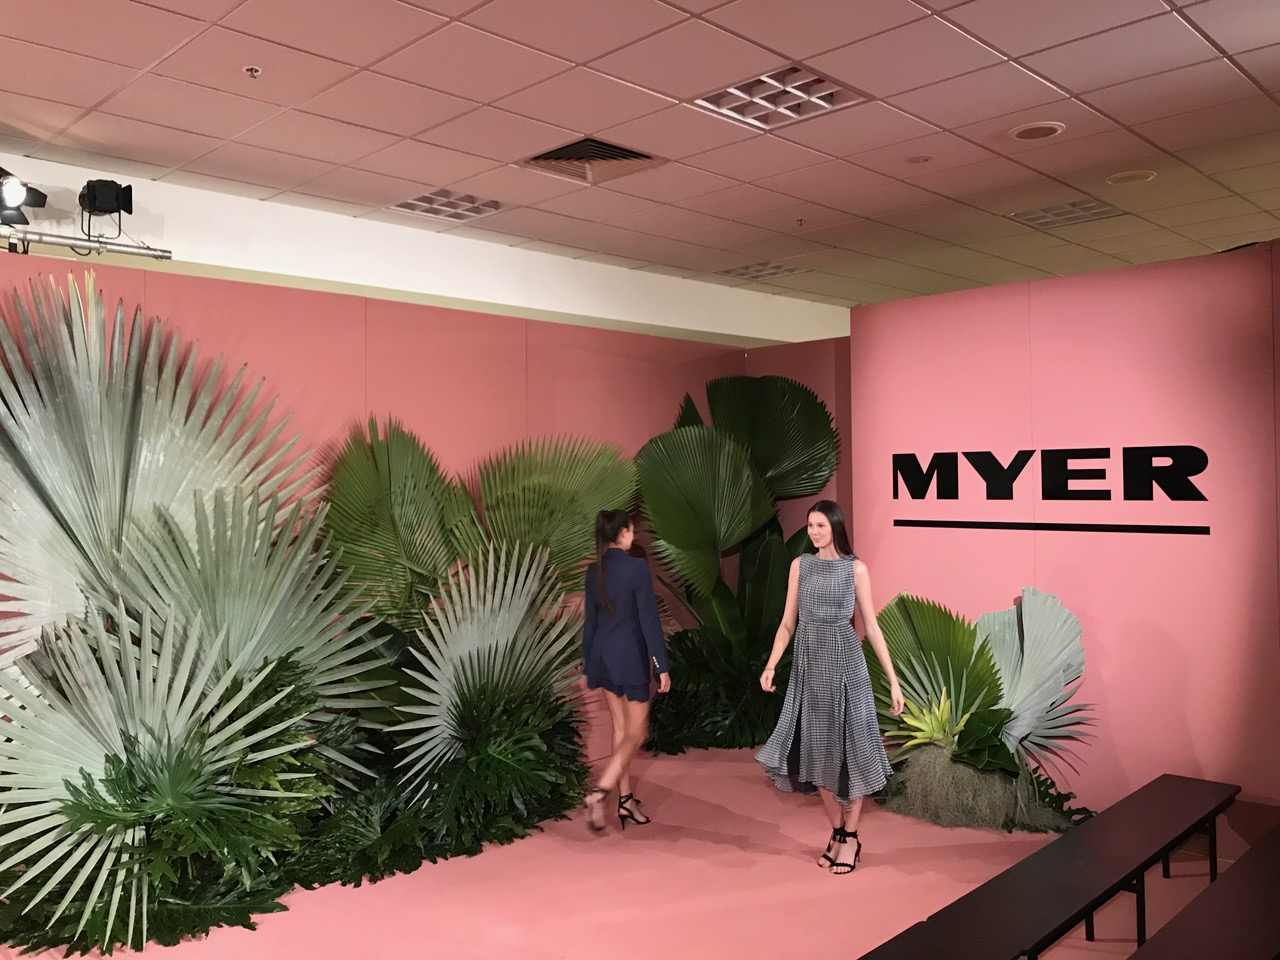 IMG 2677 1024x768 - Myer's Brisbane Spring Fashion Launch, 2018